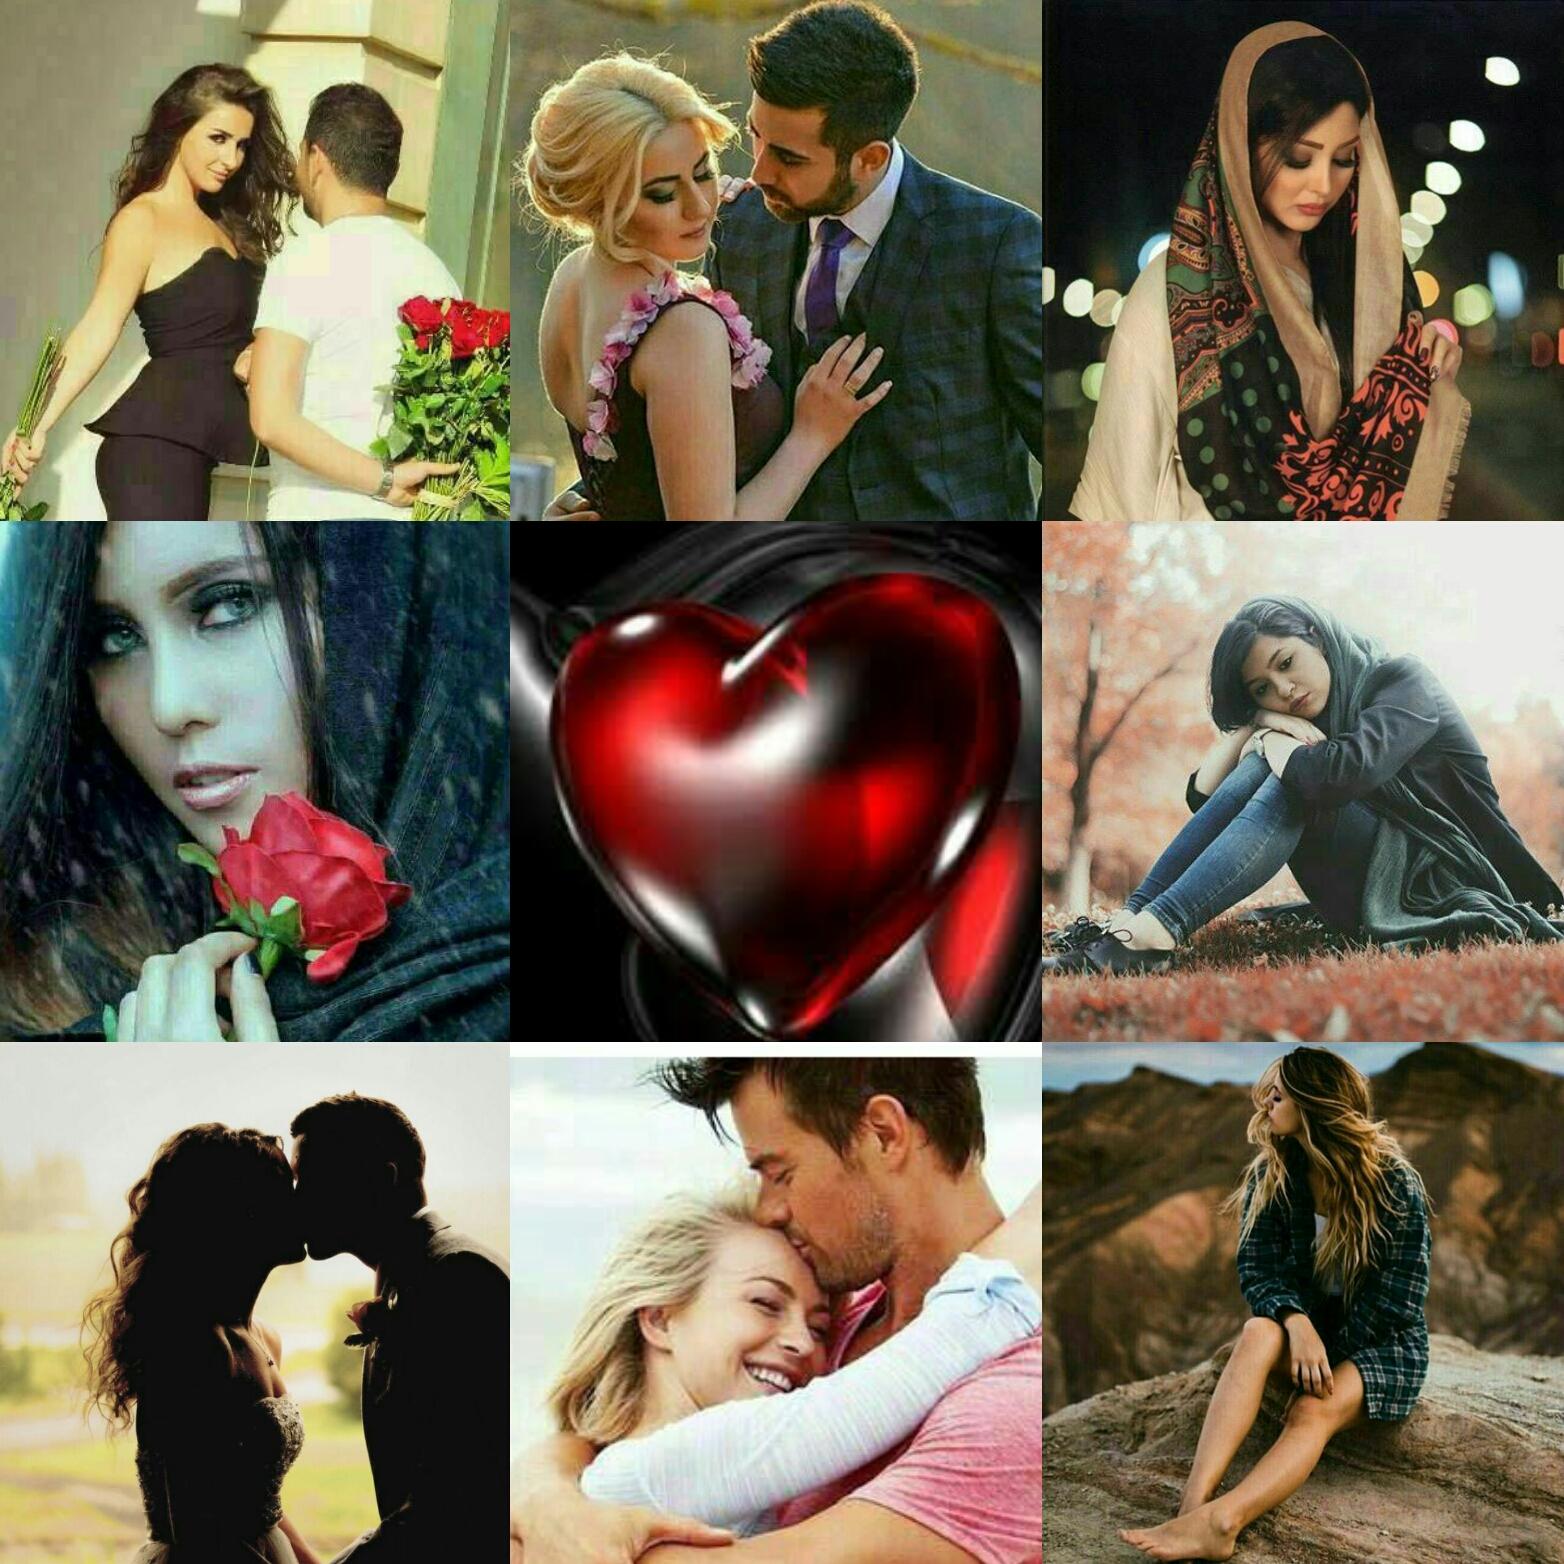 کانال تلگرامی عاشقانه